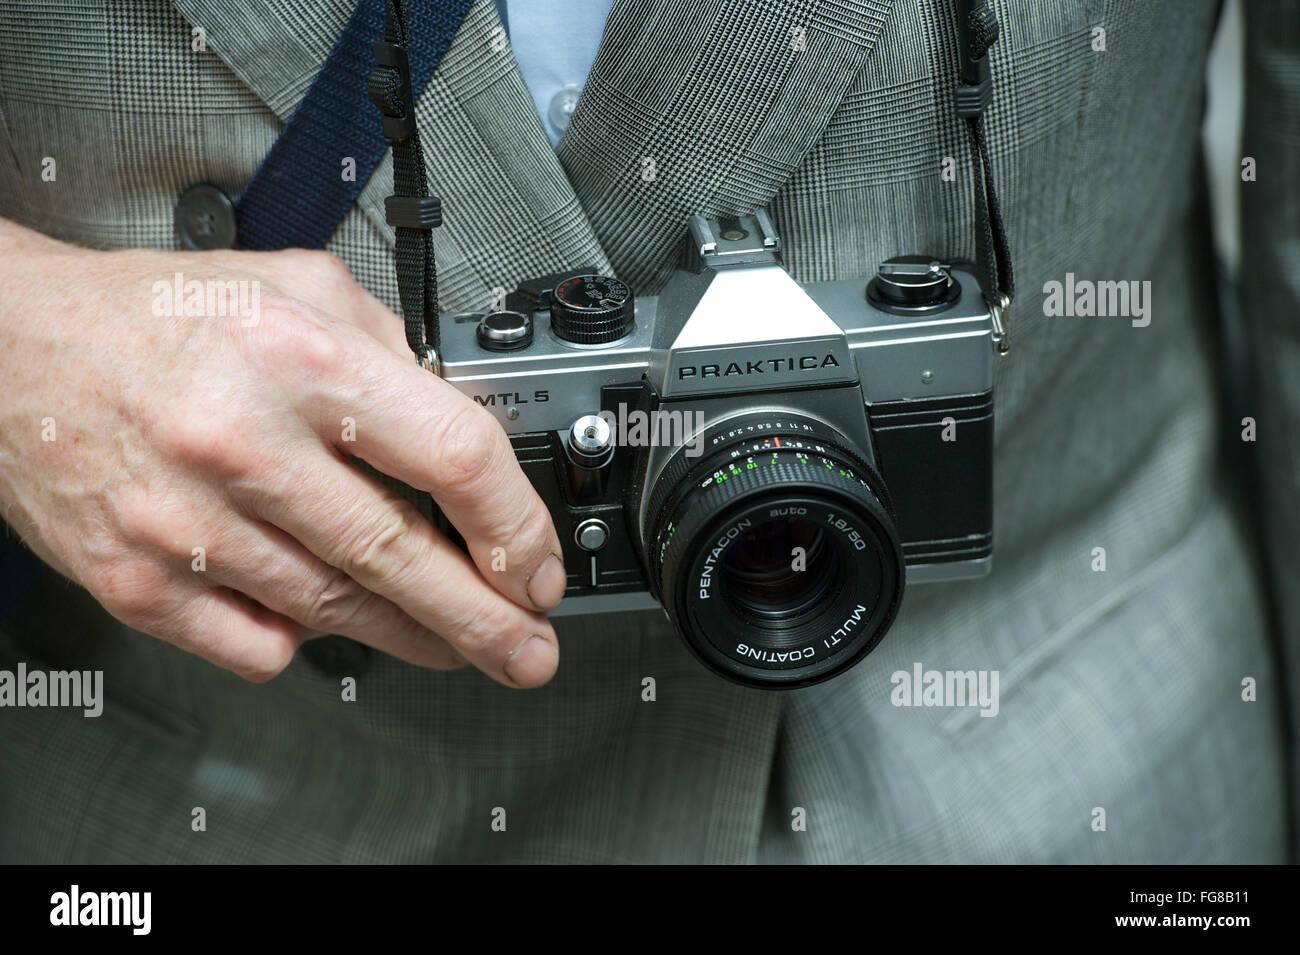 A man holds the single-lens reflex camera Praktica MTL 5 in his hands in Eisleben (district Mansfeld-Südharz), - Stock Image